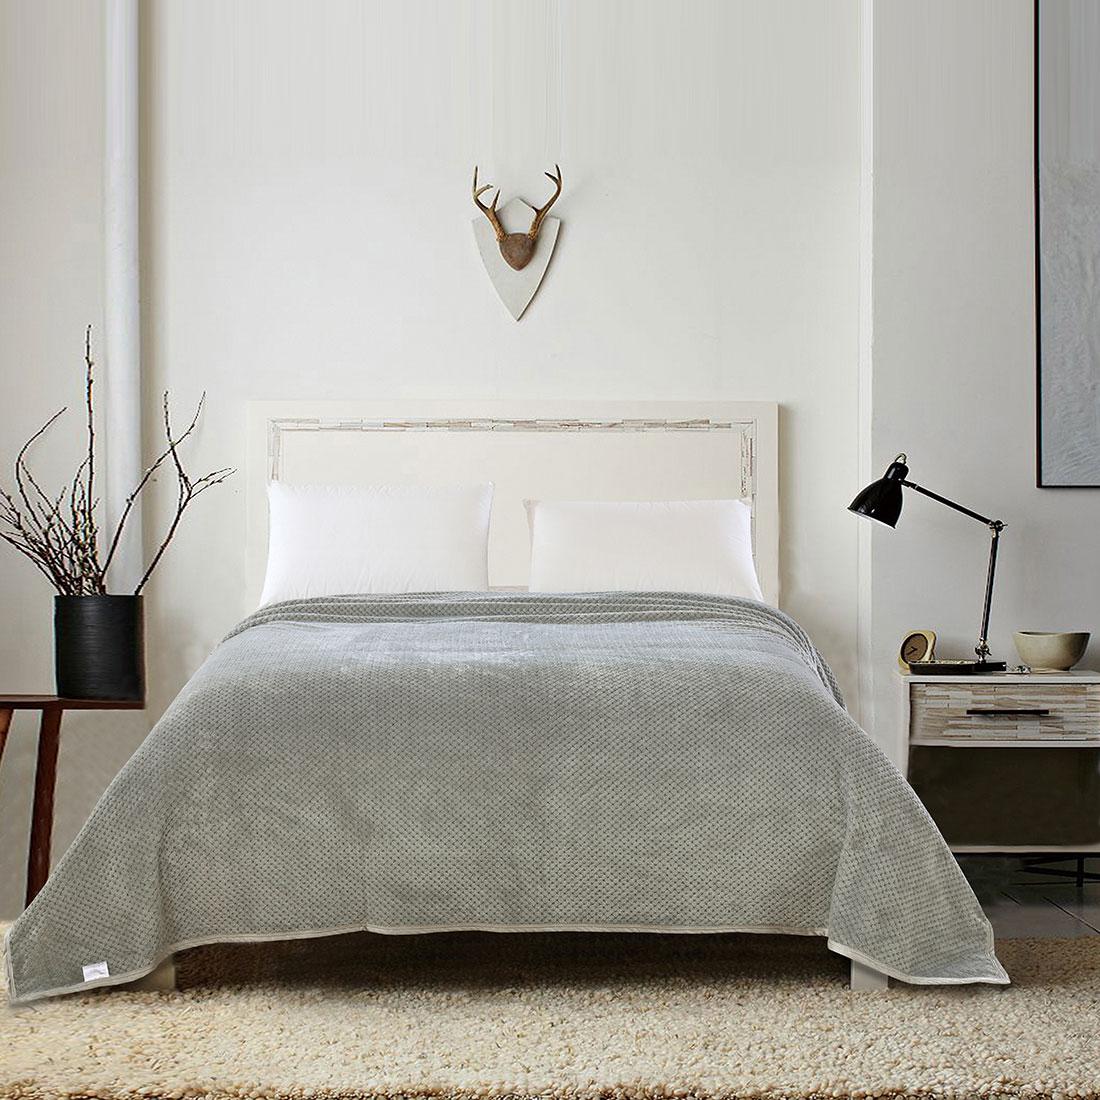 Premium Plush Throw Blanket Super soft Fleece Blanket,Twin,Full,Queen,King Size